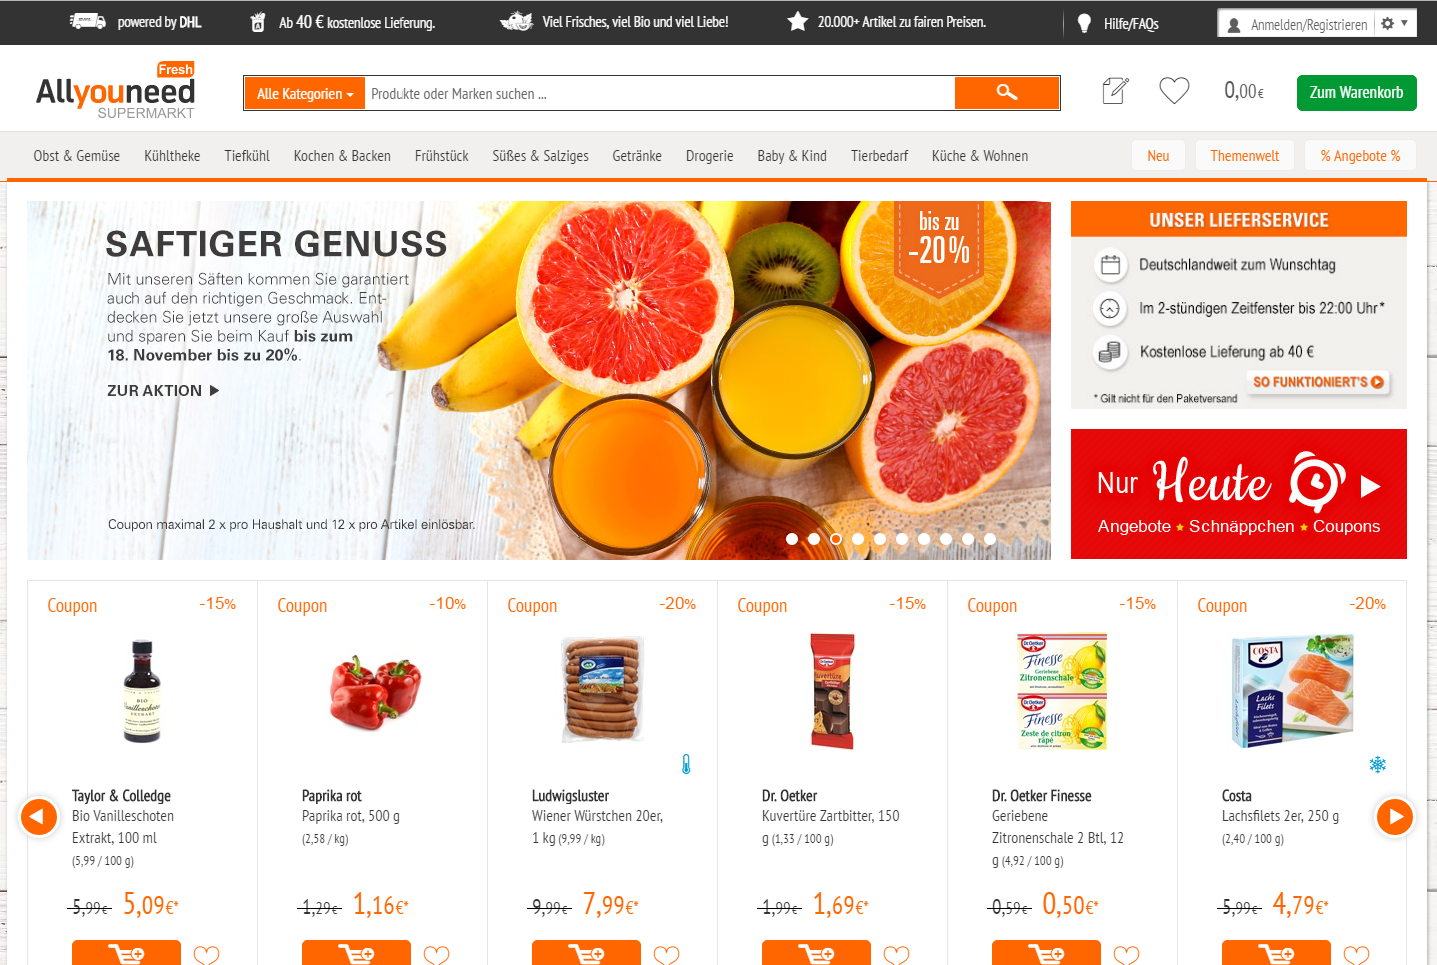 e-Commerce und Lebensmittel